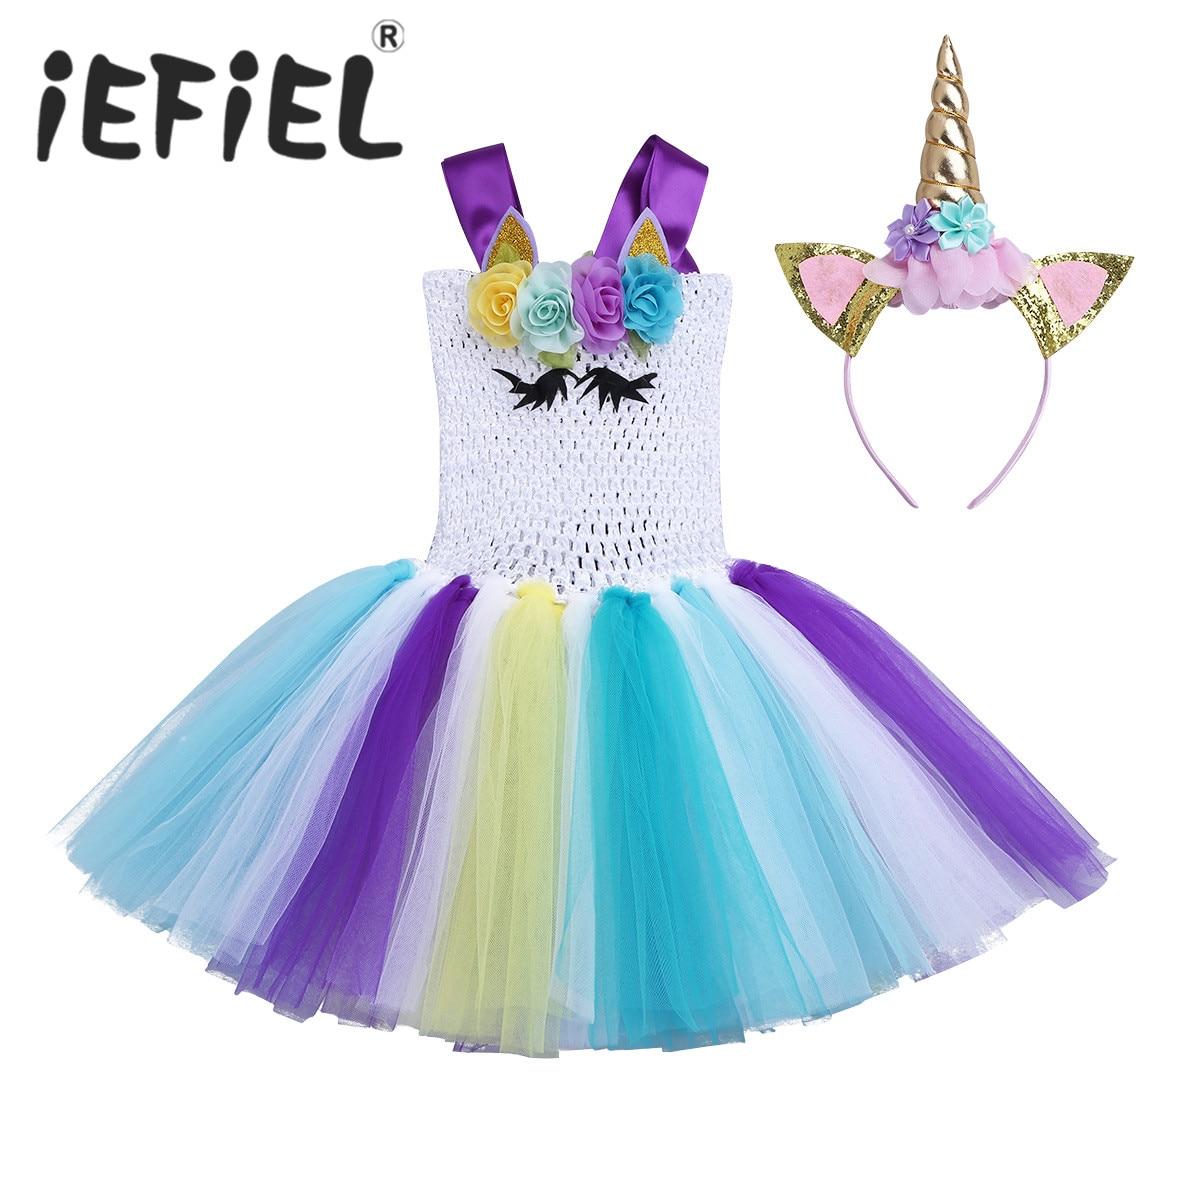 Kids Children Girls Tutu Dress Princess Kids Birthday Party Cosplay Dress Girls Christmas Halloween Fancy Dress Up Costumes